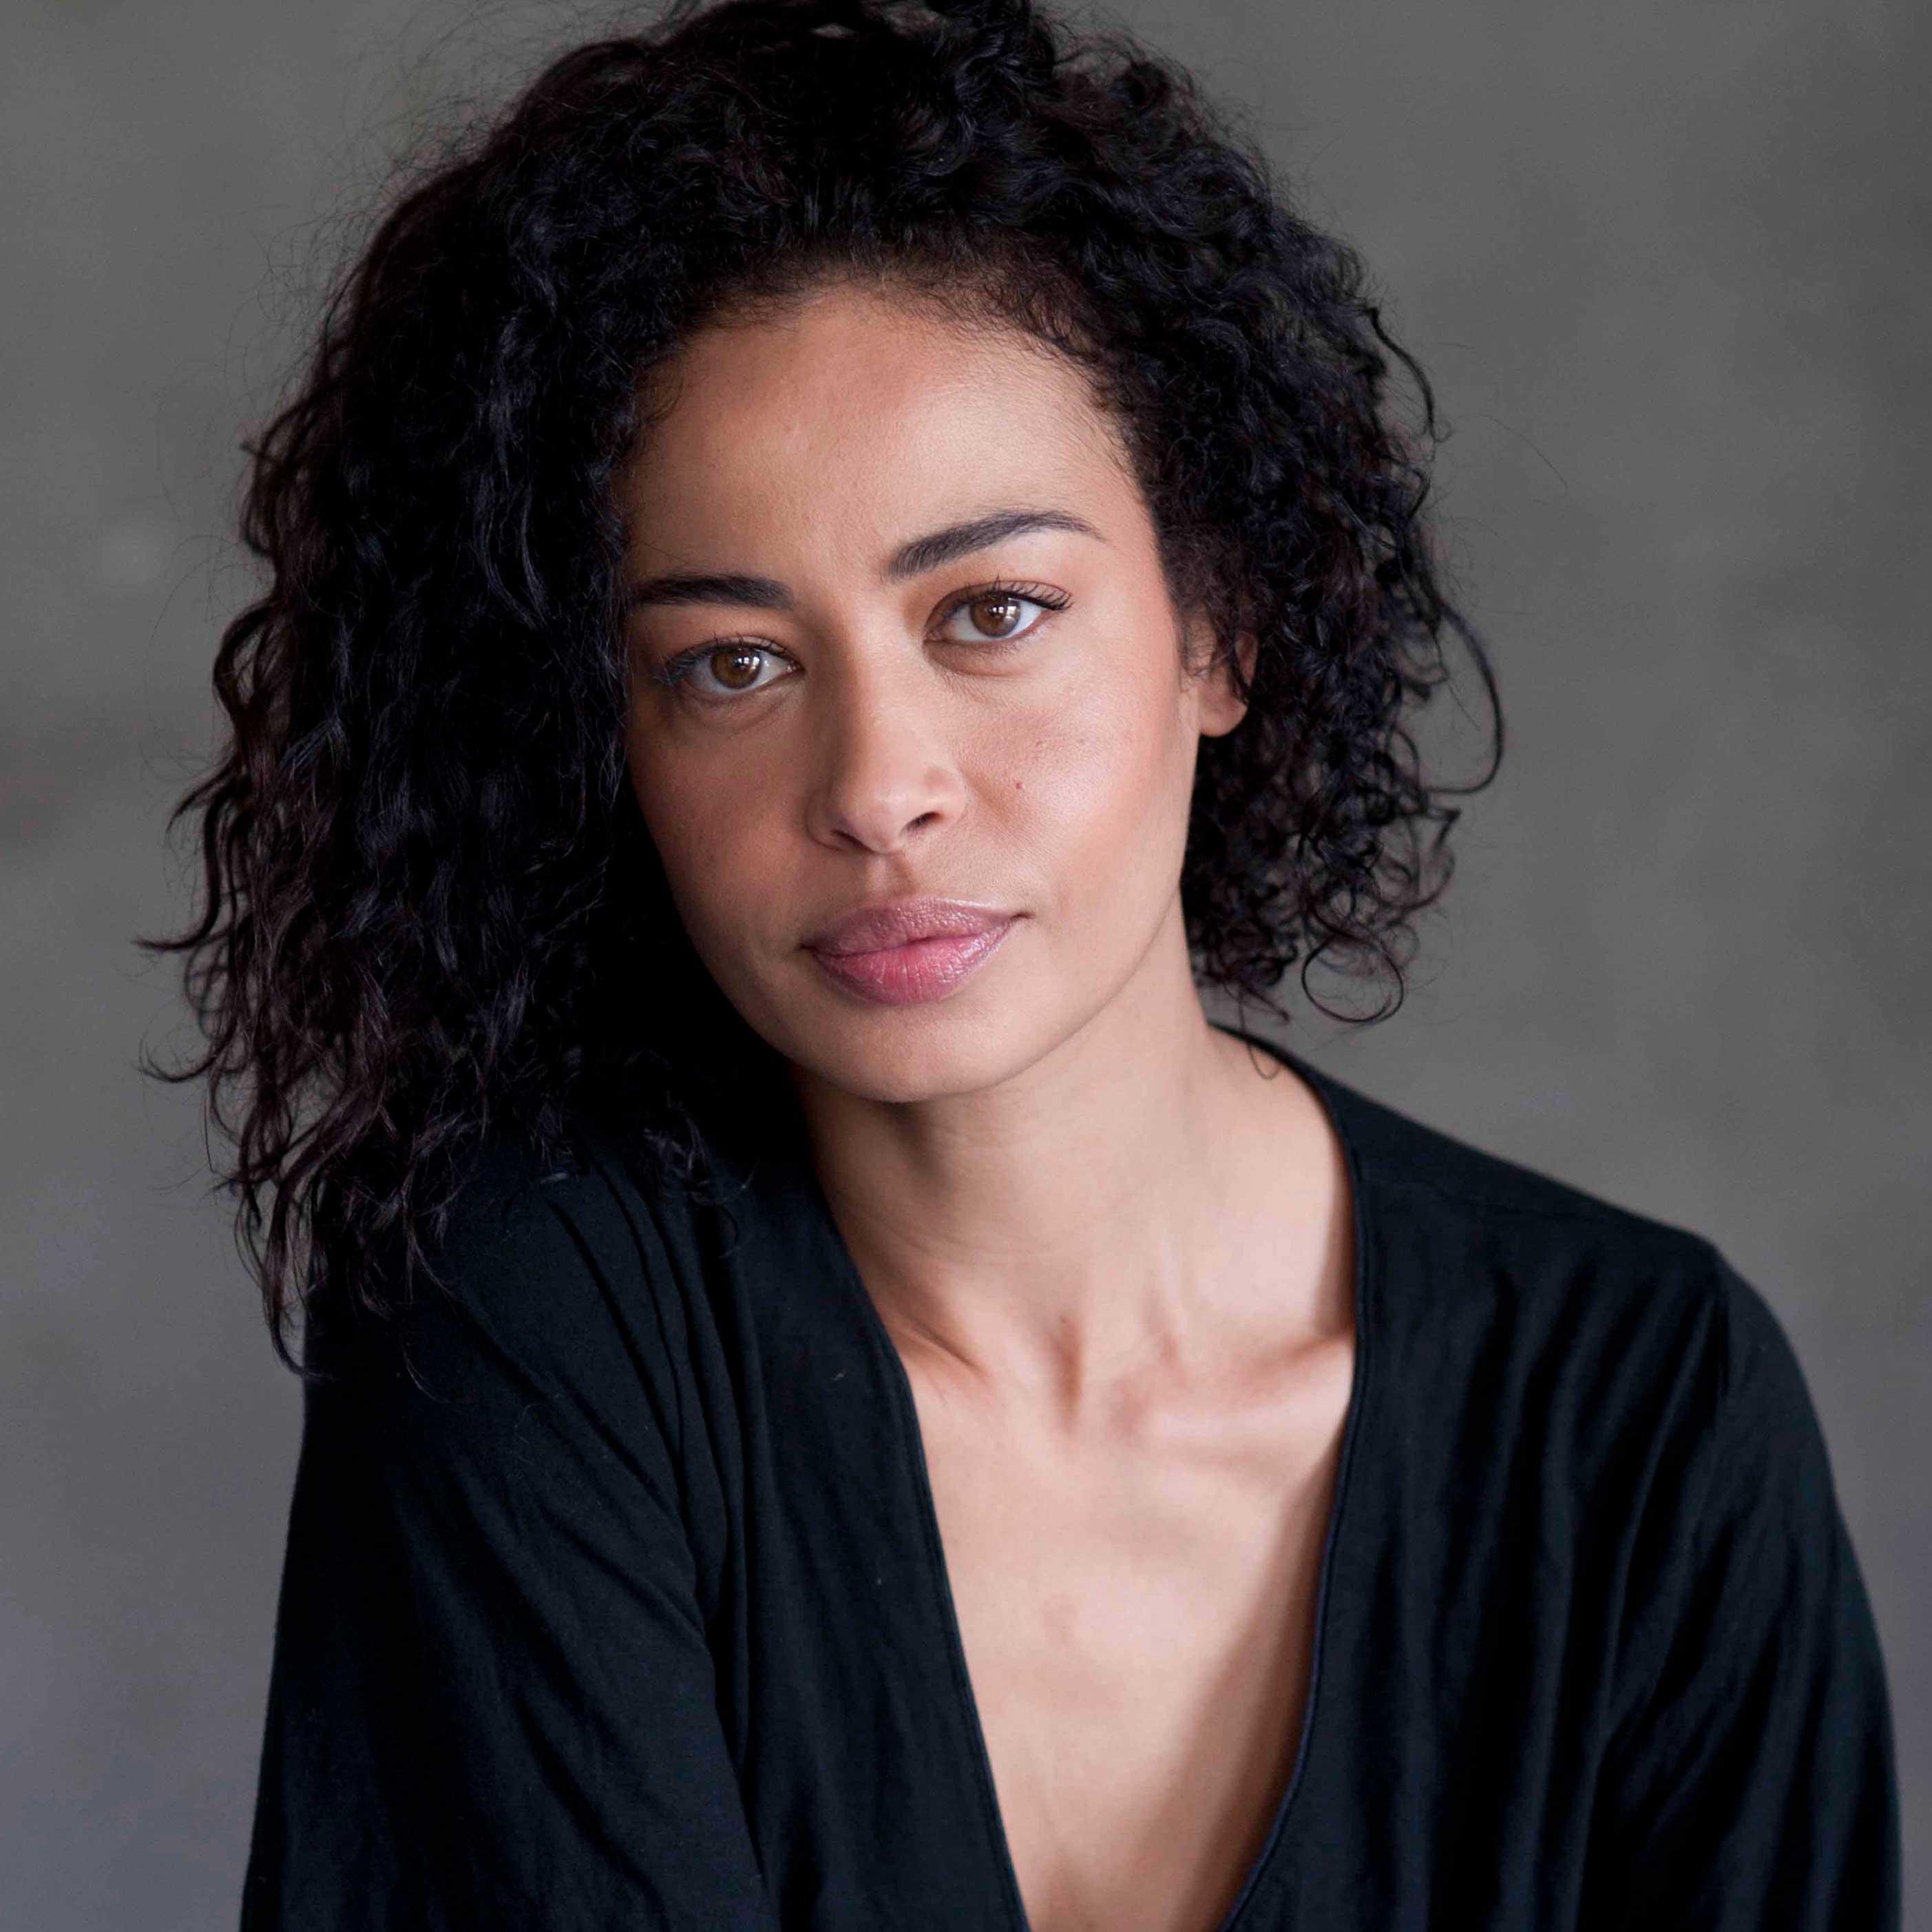 Sofia Baessa